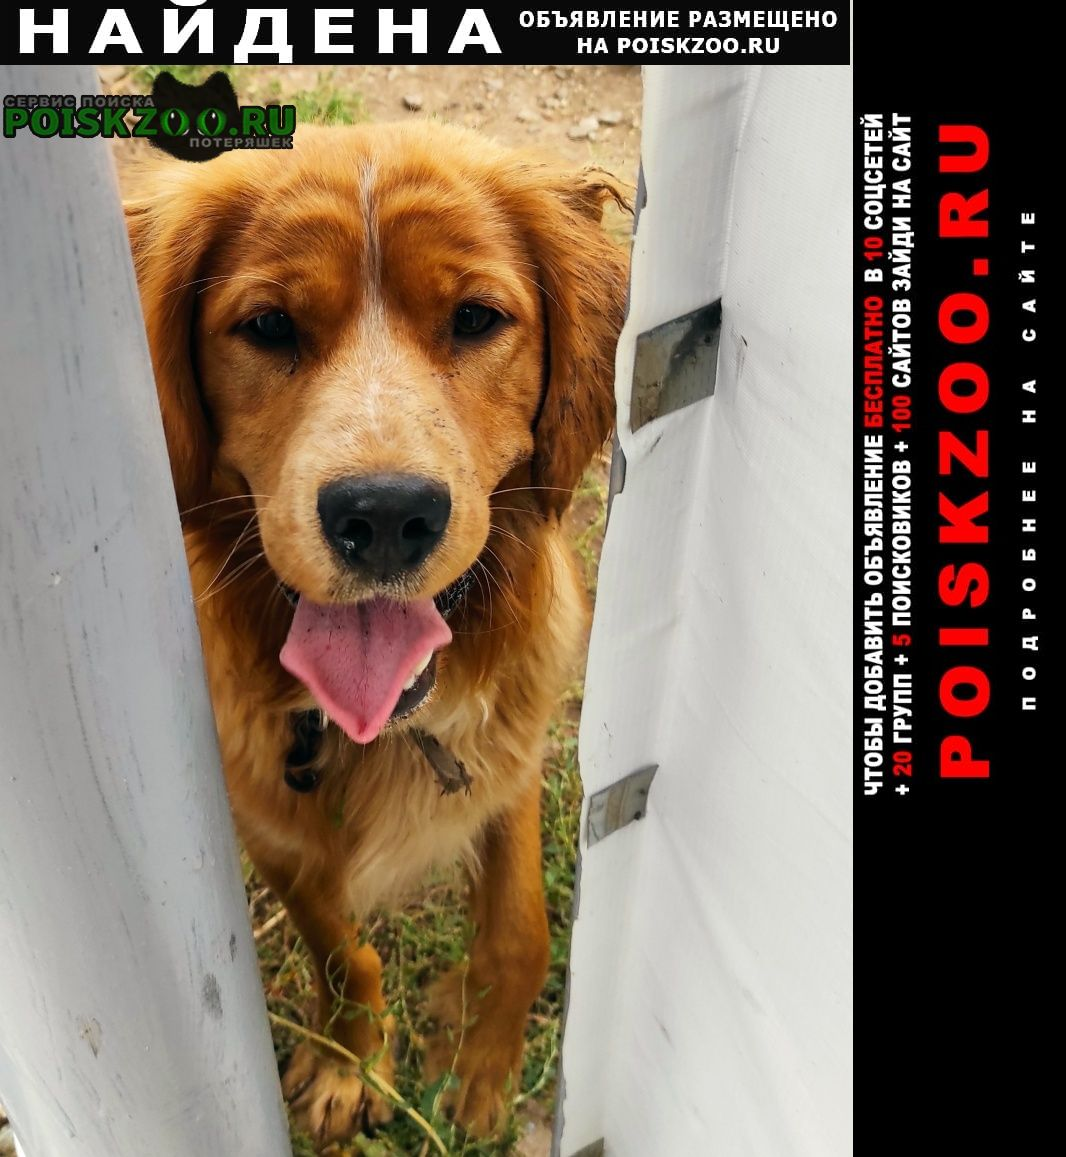 Найдена собака Оренбург